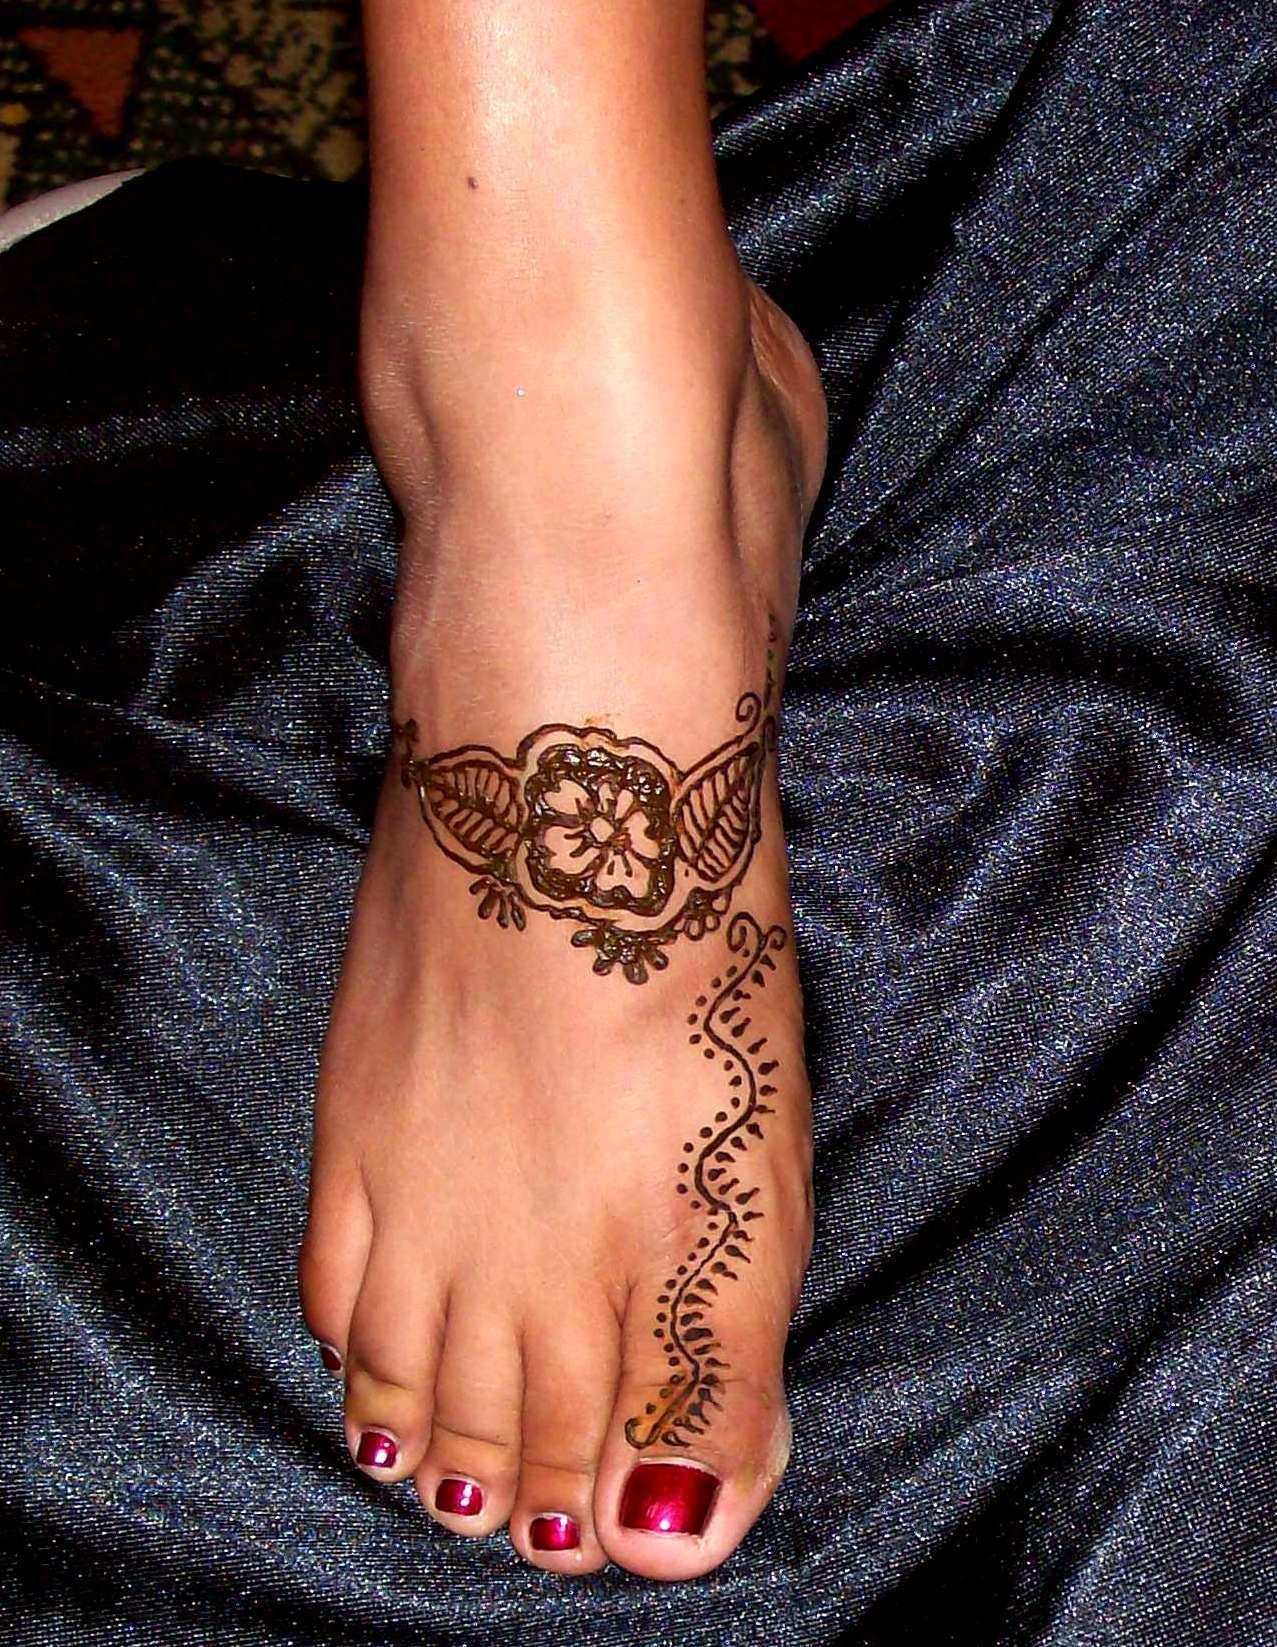 Henna Tattoo Designs For Love: 30 Henna Tattoos Design Ideas For Girls